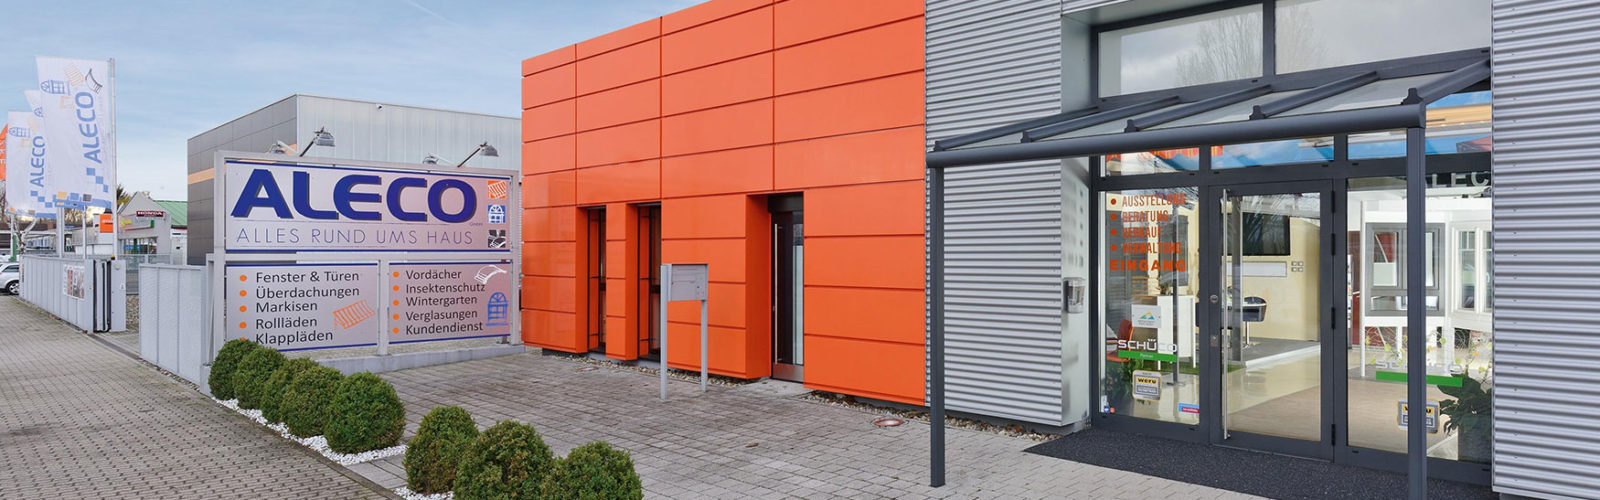 Firmengebäude Aleco